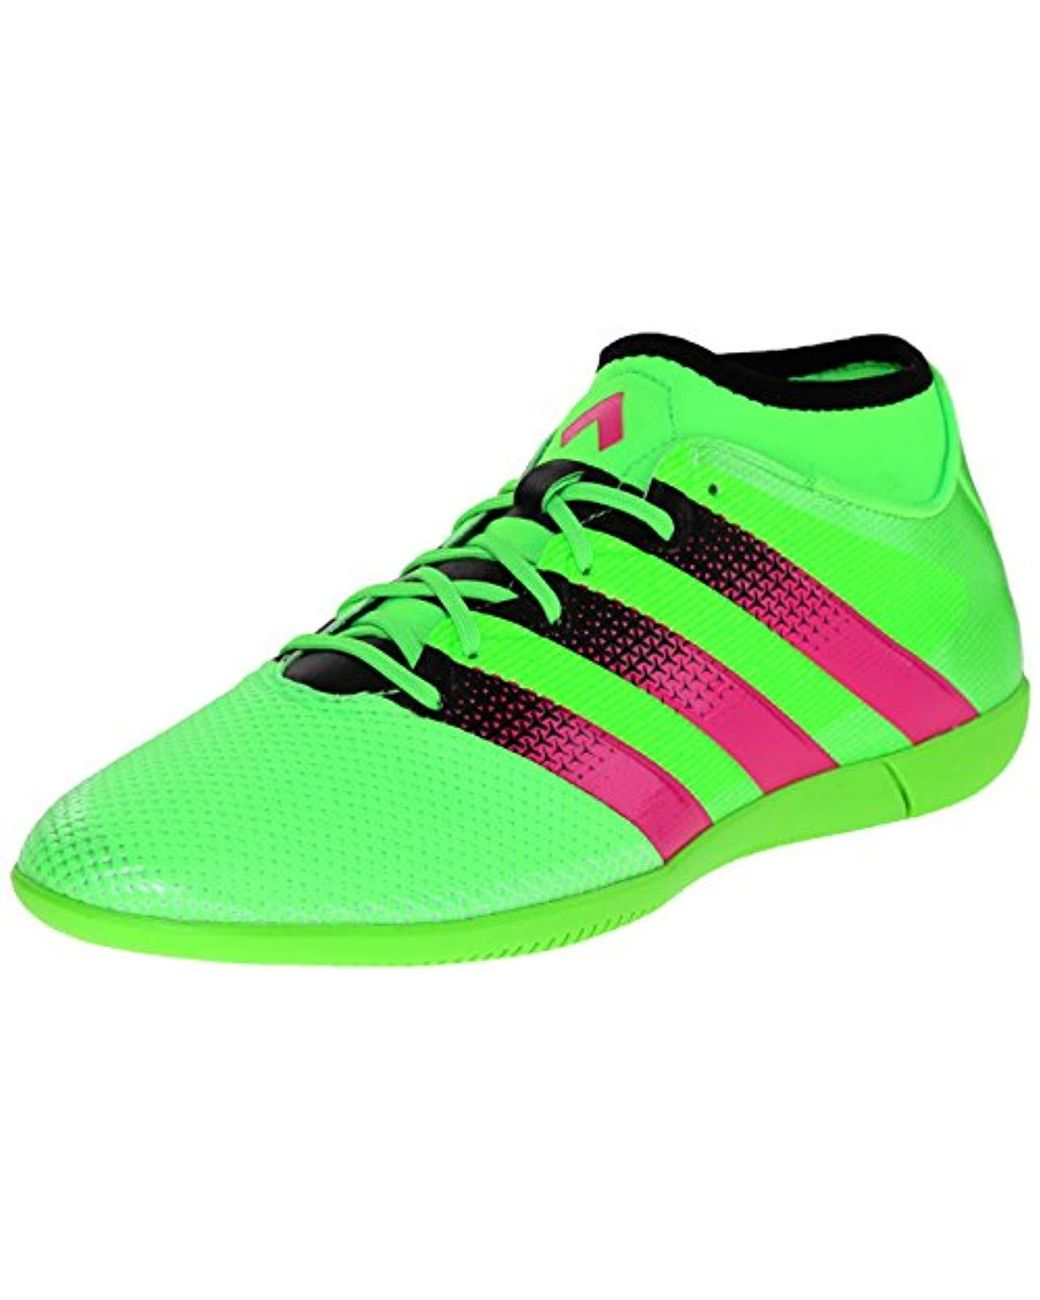 e6724712c adidas Performance Ace 16.3 Primesh Indoor Soccer Shoe,shock Green/shock  Pink/black,6.5 M Us in Green for Men - Lyst